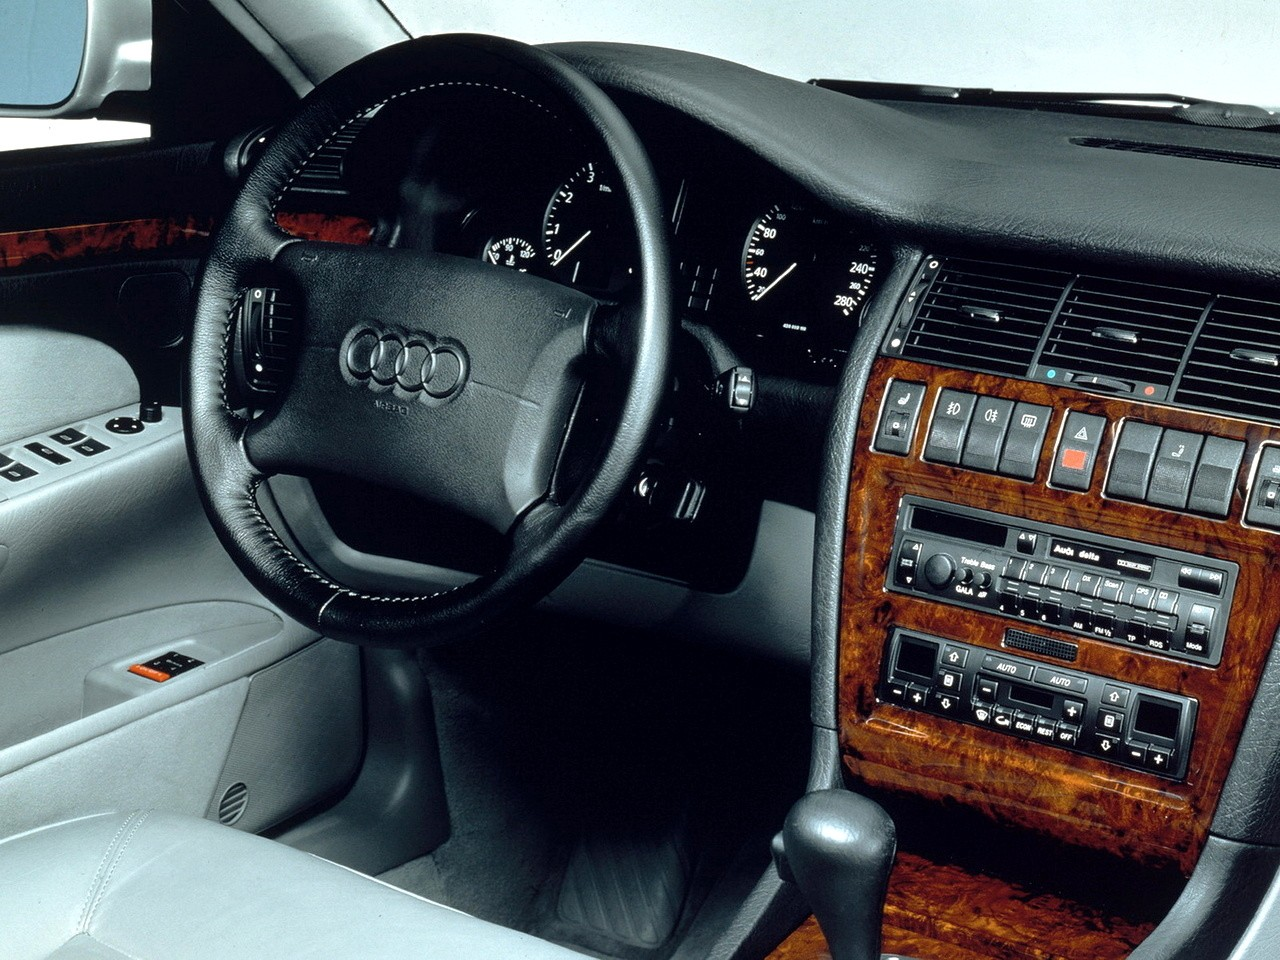 Toyota Supra Stock >> AUDI A8 (D2) - 1994, 1995, 1996, 1997, 1998, 1999 - autoevolution